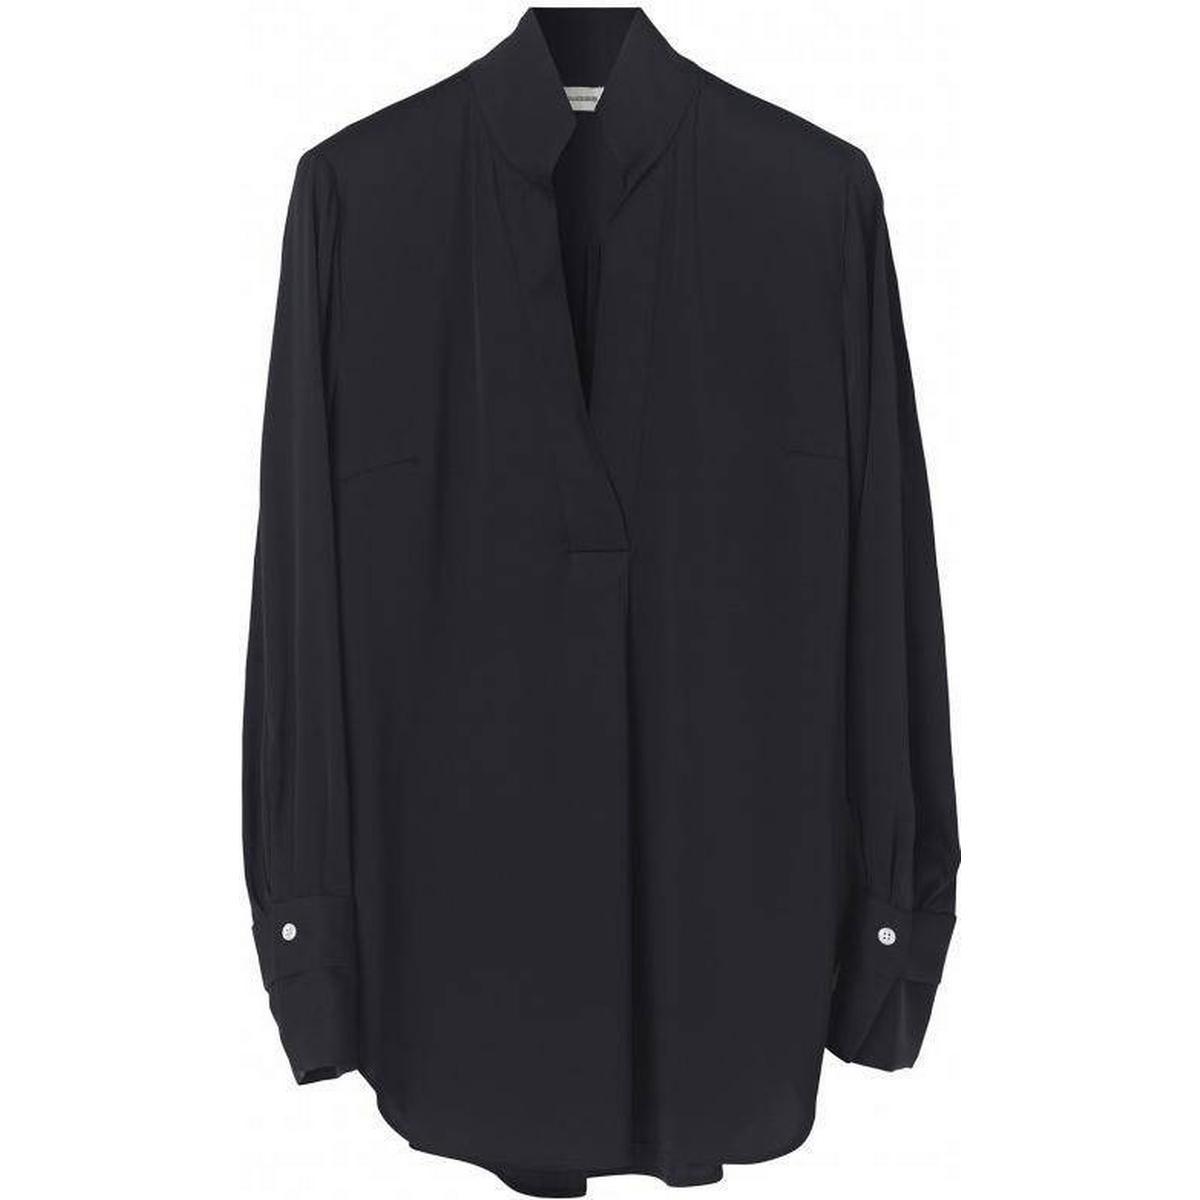 0a509a05b8c By Malene Birger Skjorte Dametøj - Sammenlign priser hos PriceRunner